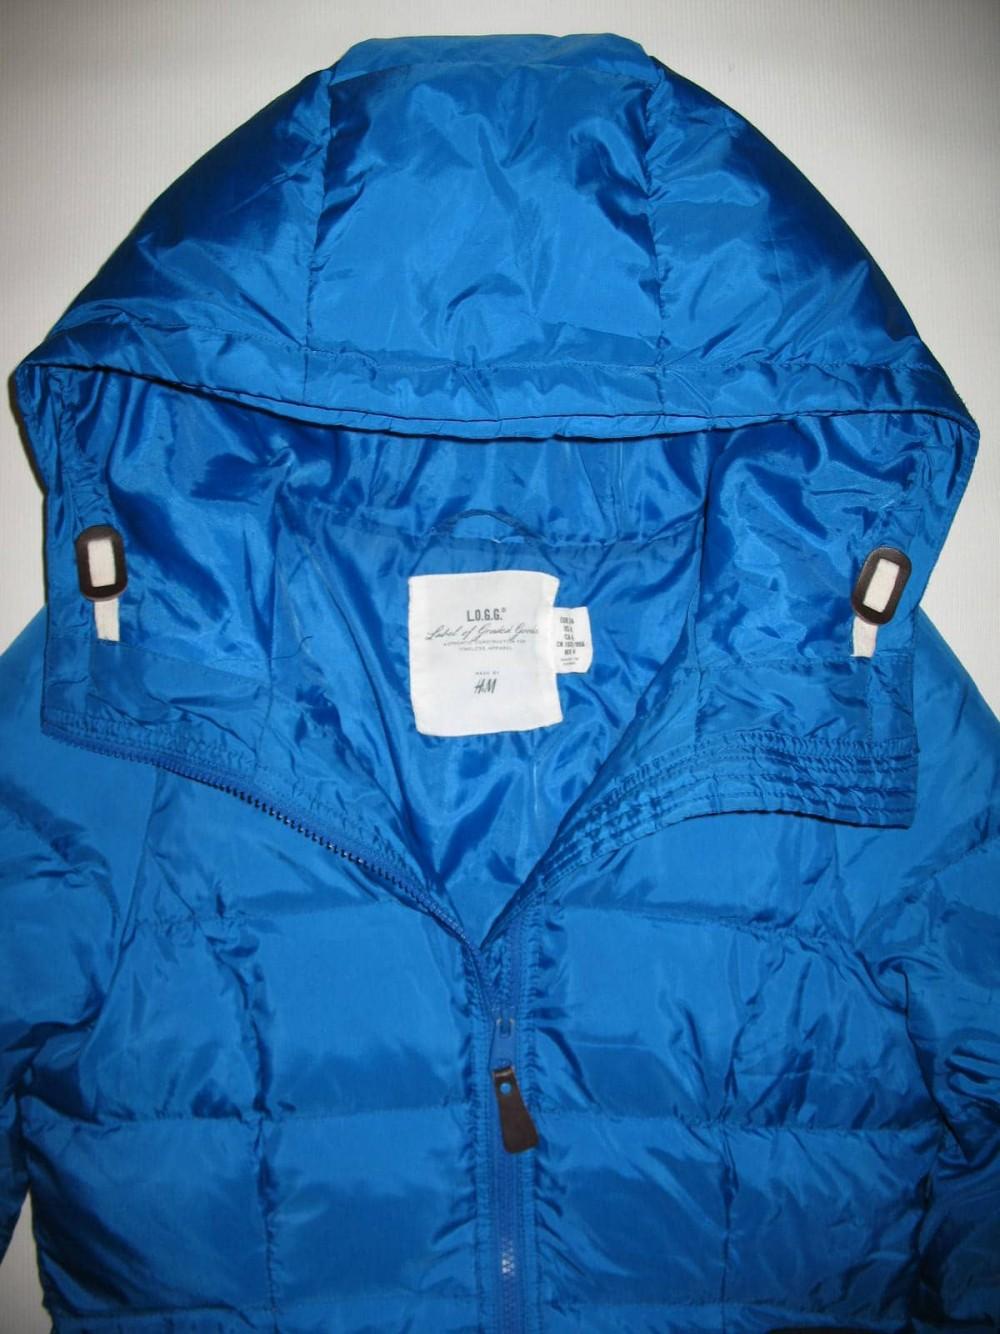 Куртка LOGG outdoor down jacket lady (размер S/XS) - 3